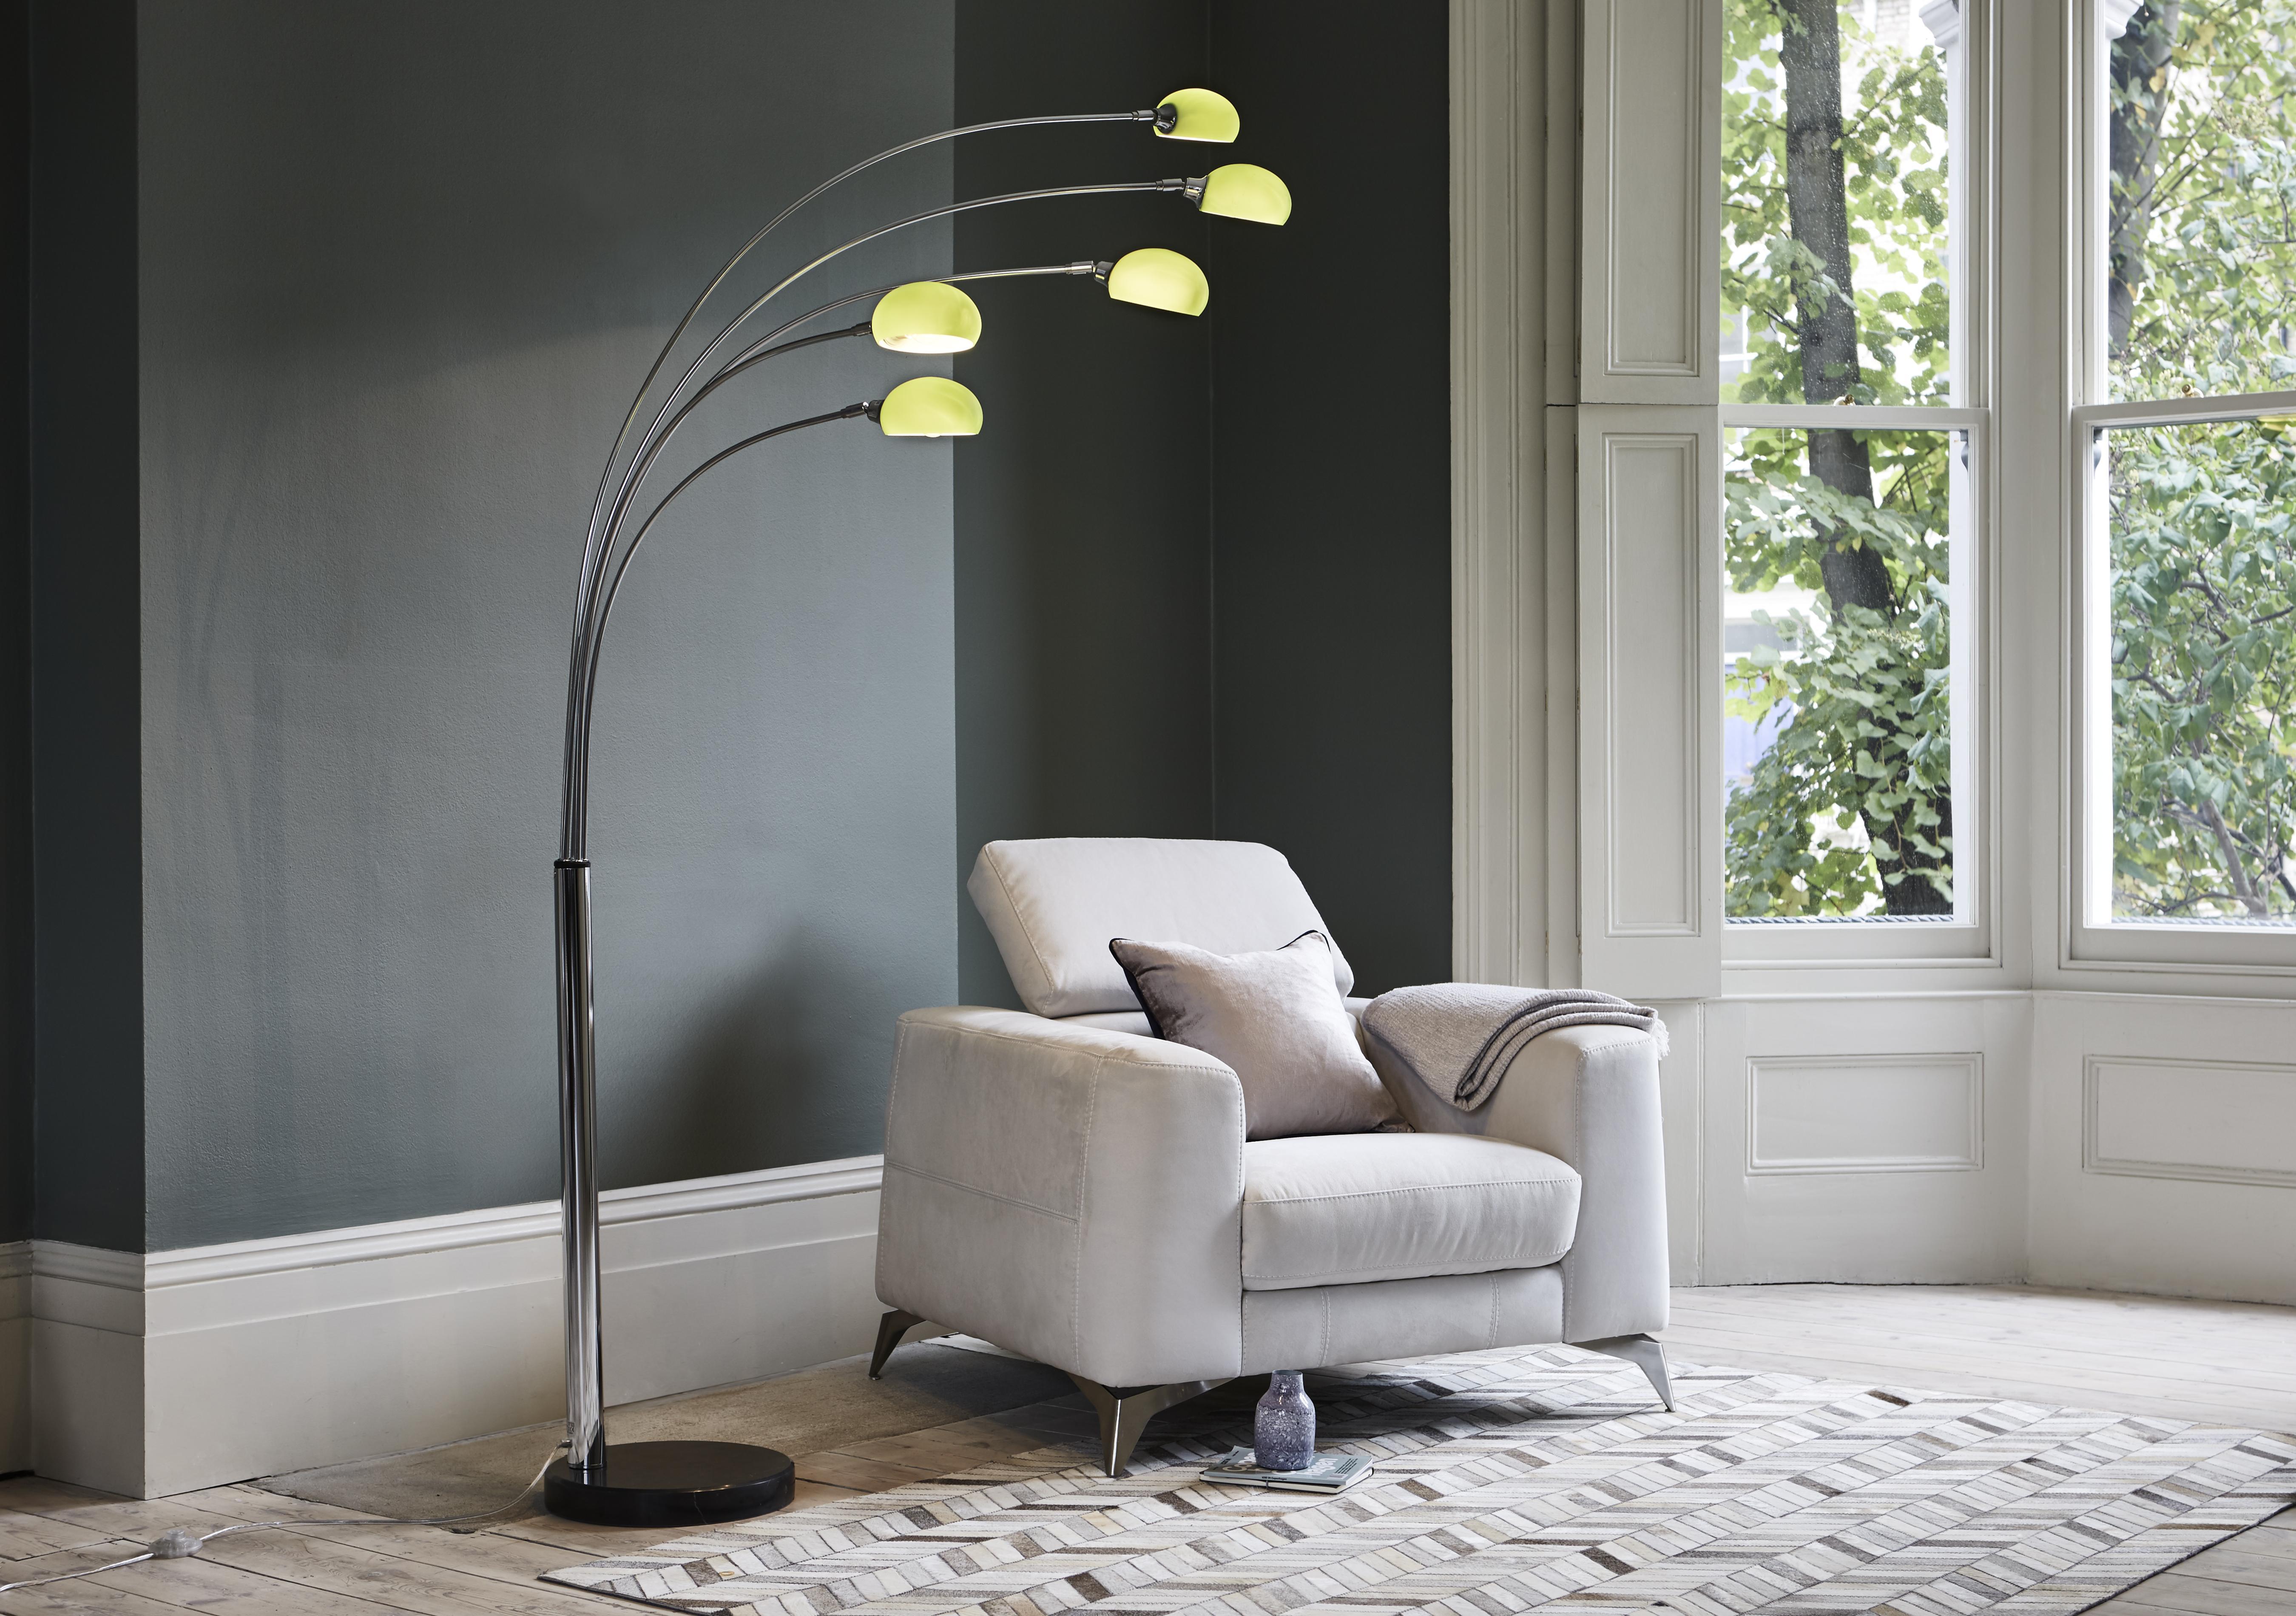 lounge lighting. Lounge Floor Lamp Lighting R